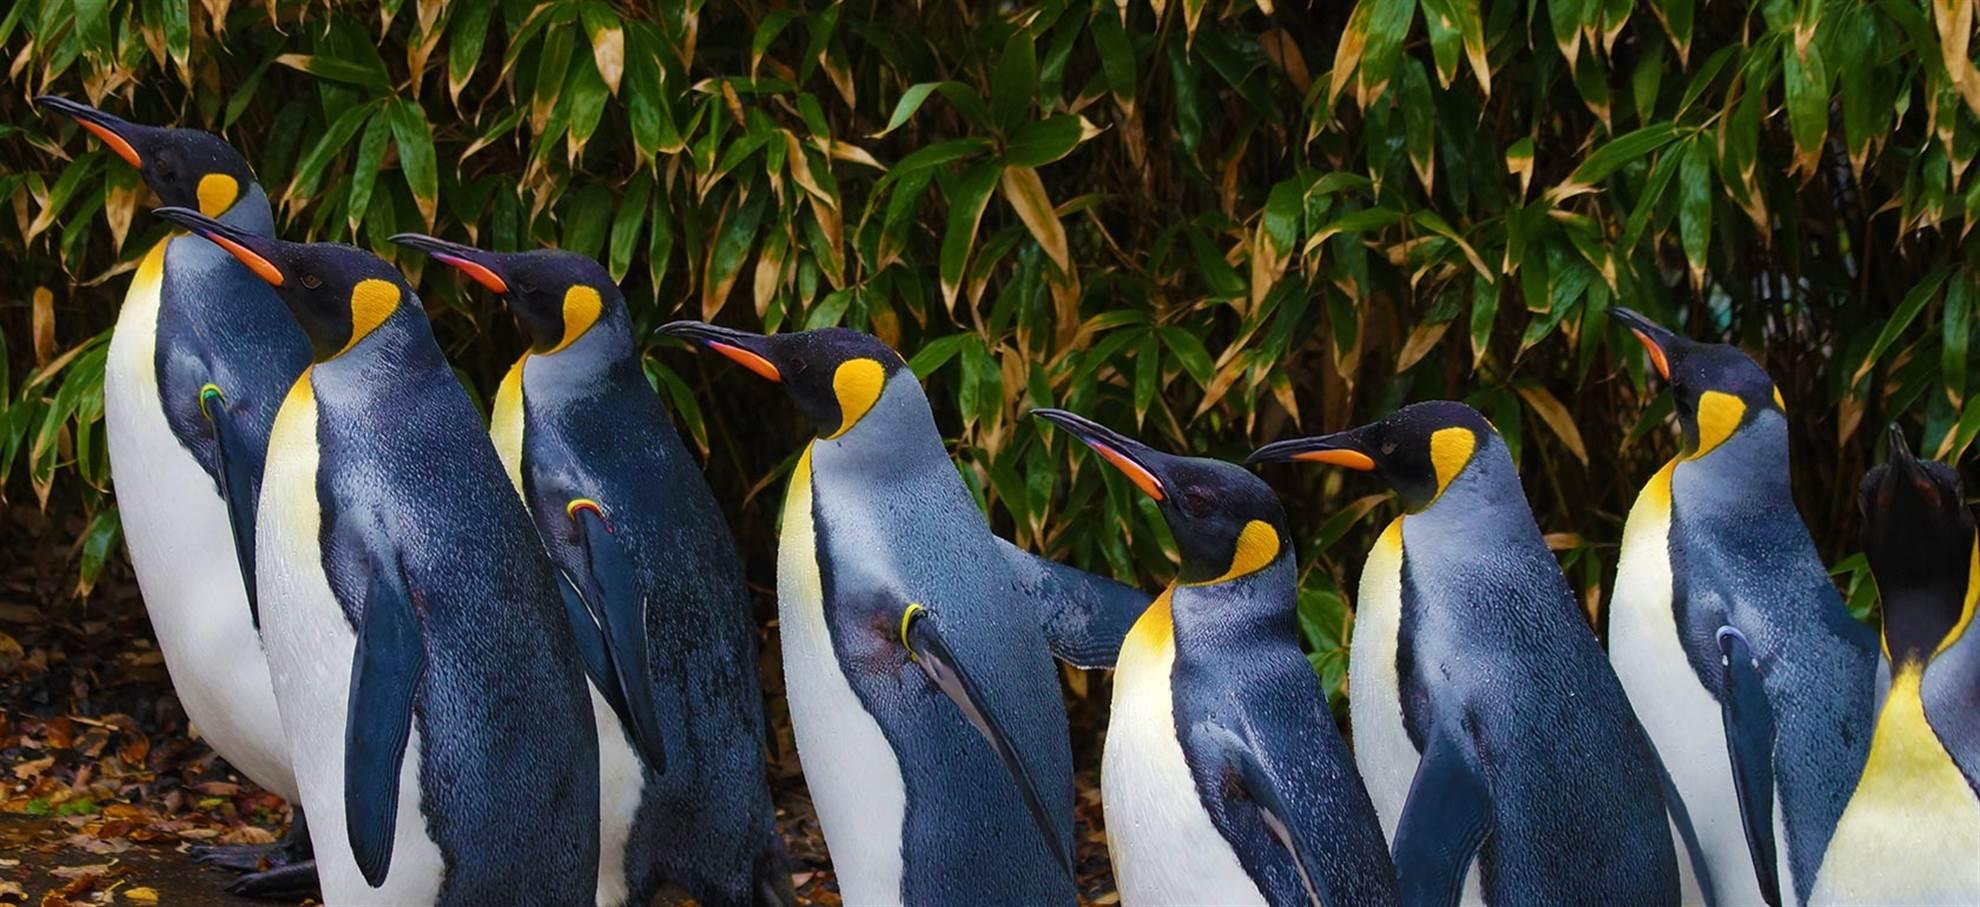 Penguin Parade with Penguins Plus